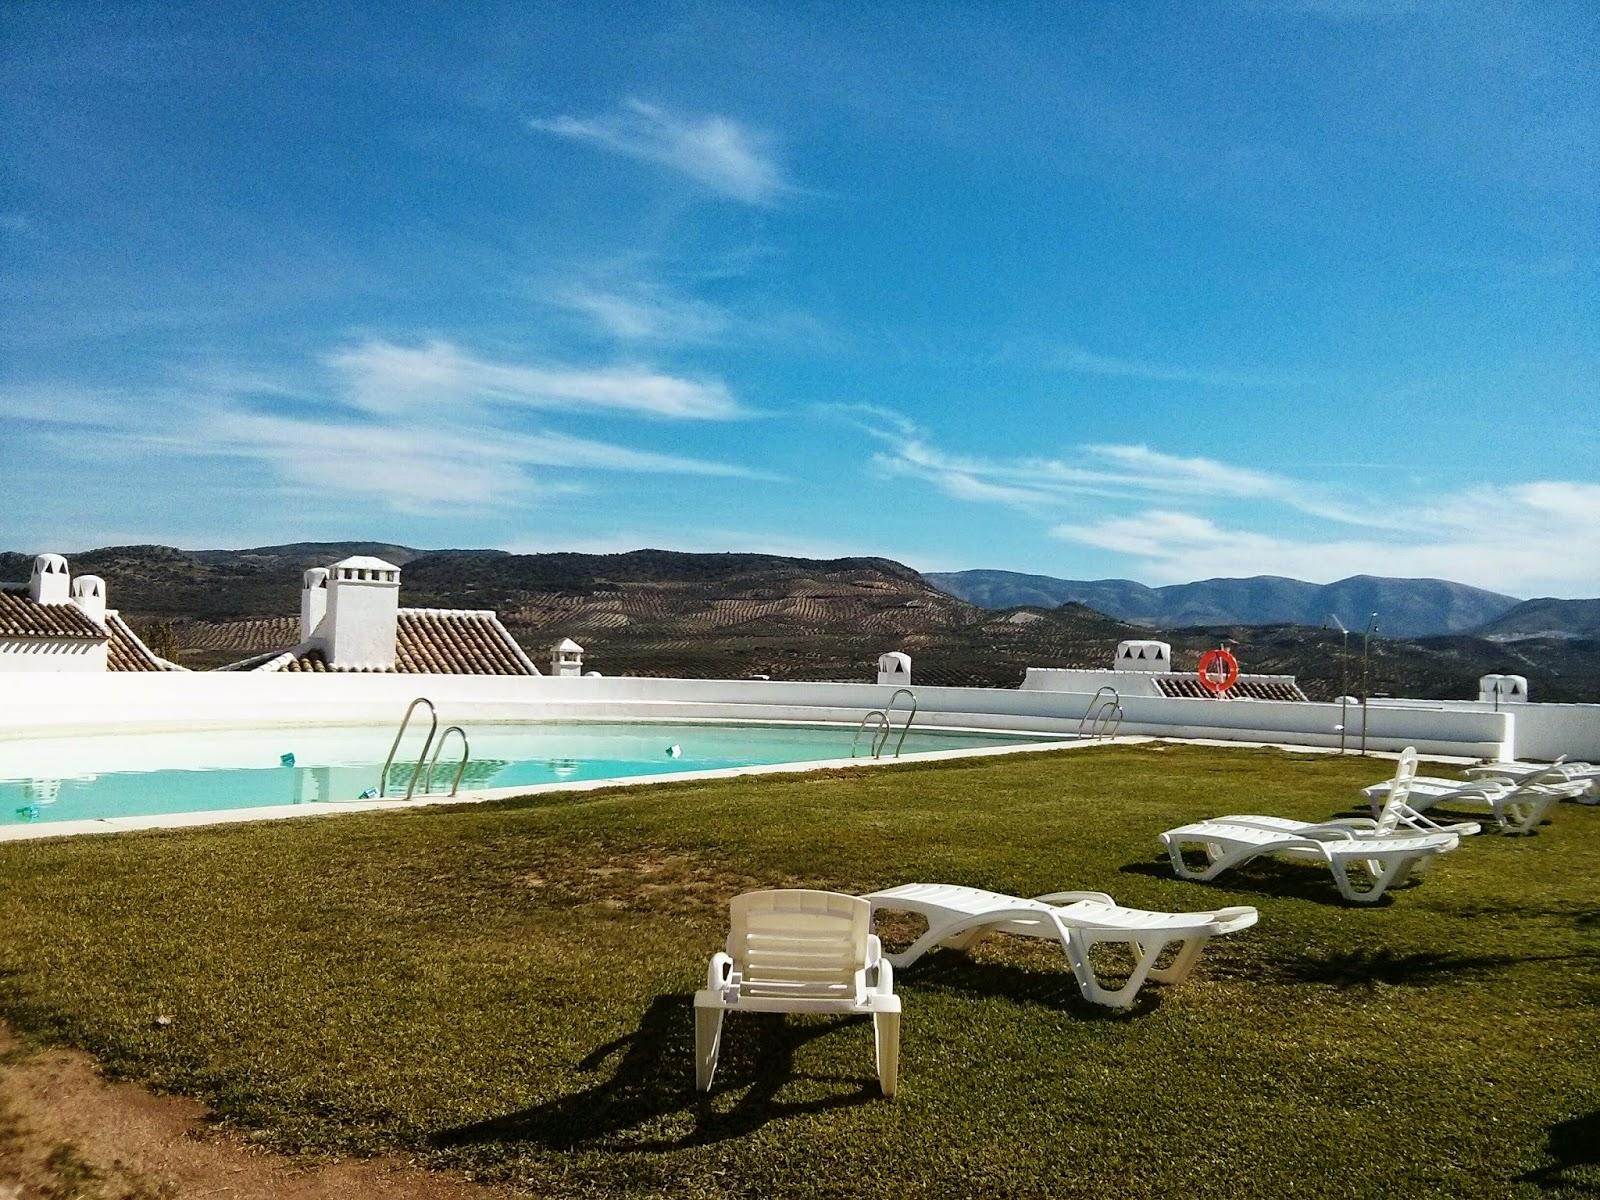 Villa Turística de Priego - Piscina principal